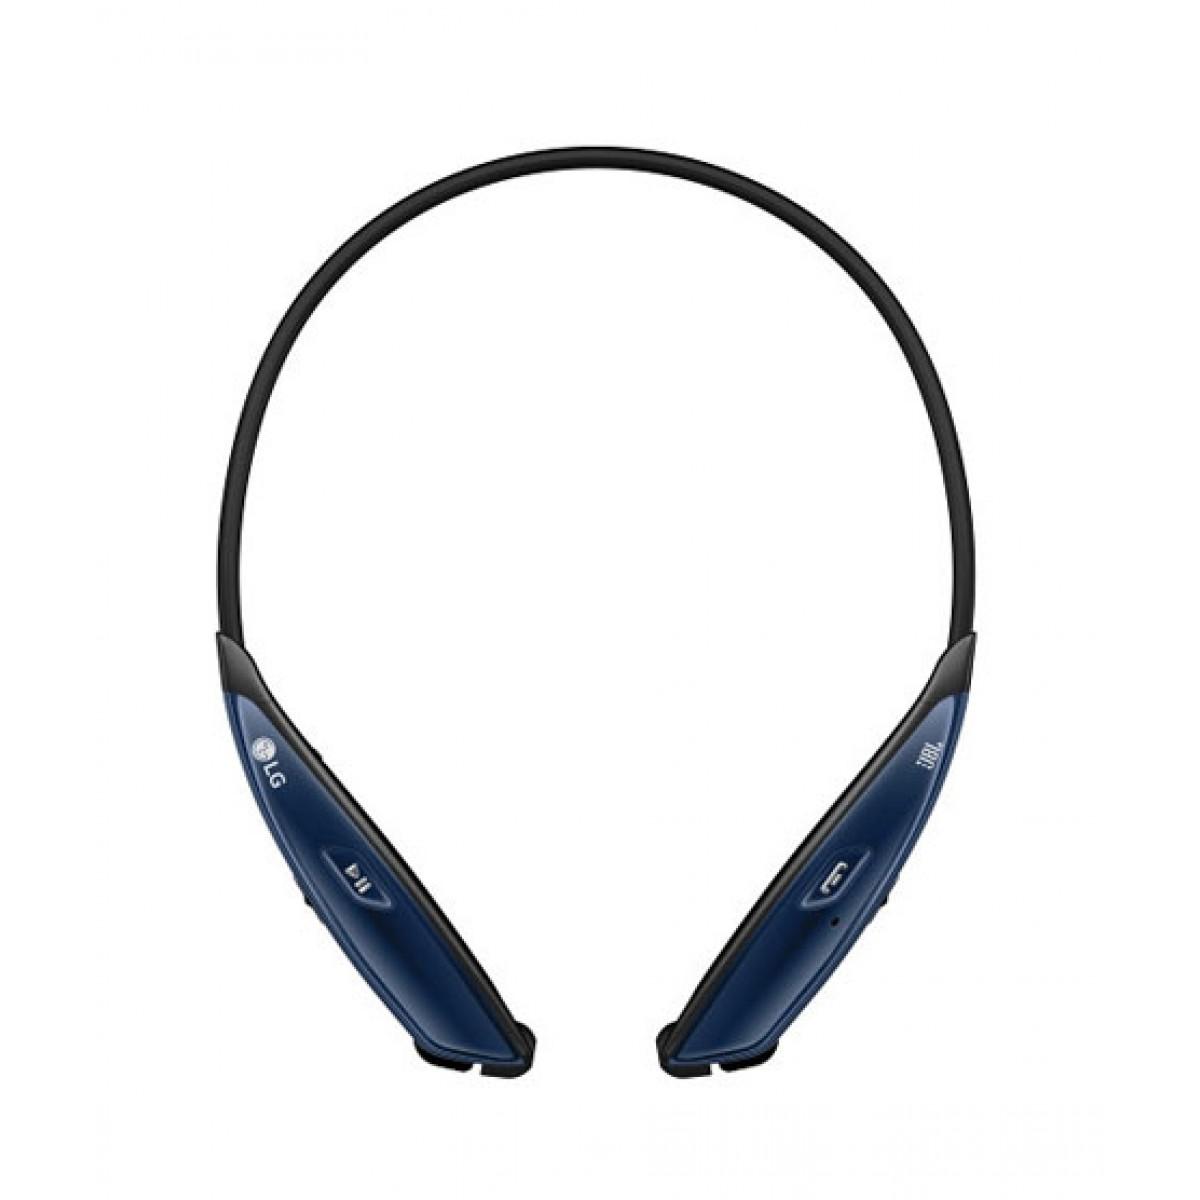 0b2d71c8571 LG Wireless Headset Price in Pakistan   Buy LG Tone Ultra Premium Headset  Navy Blue (HBS-810)   iShopping.pk